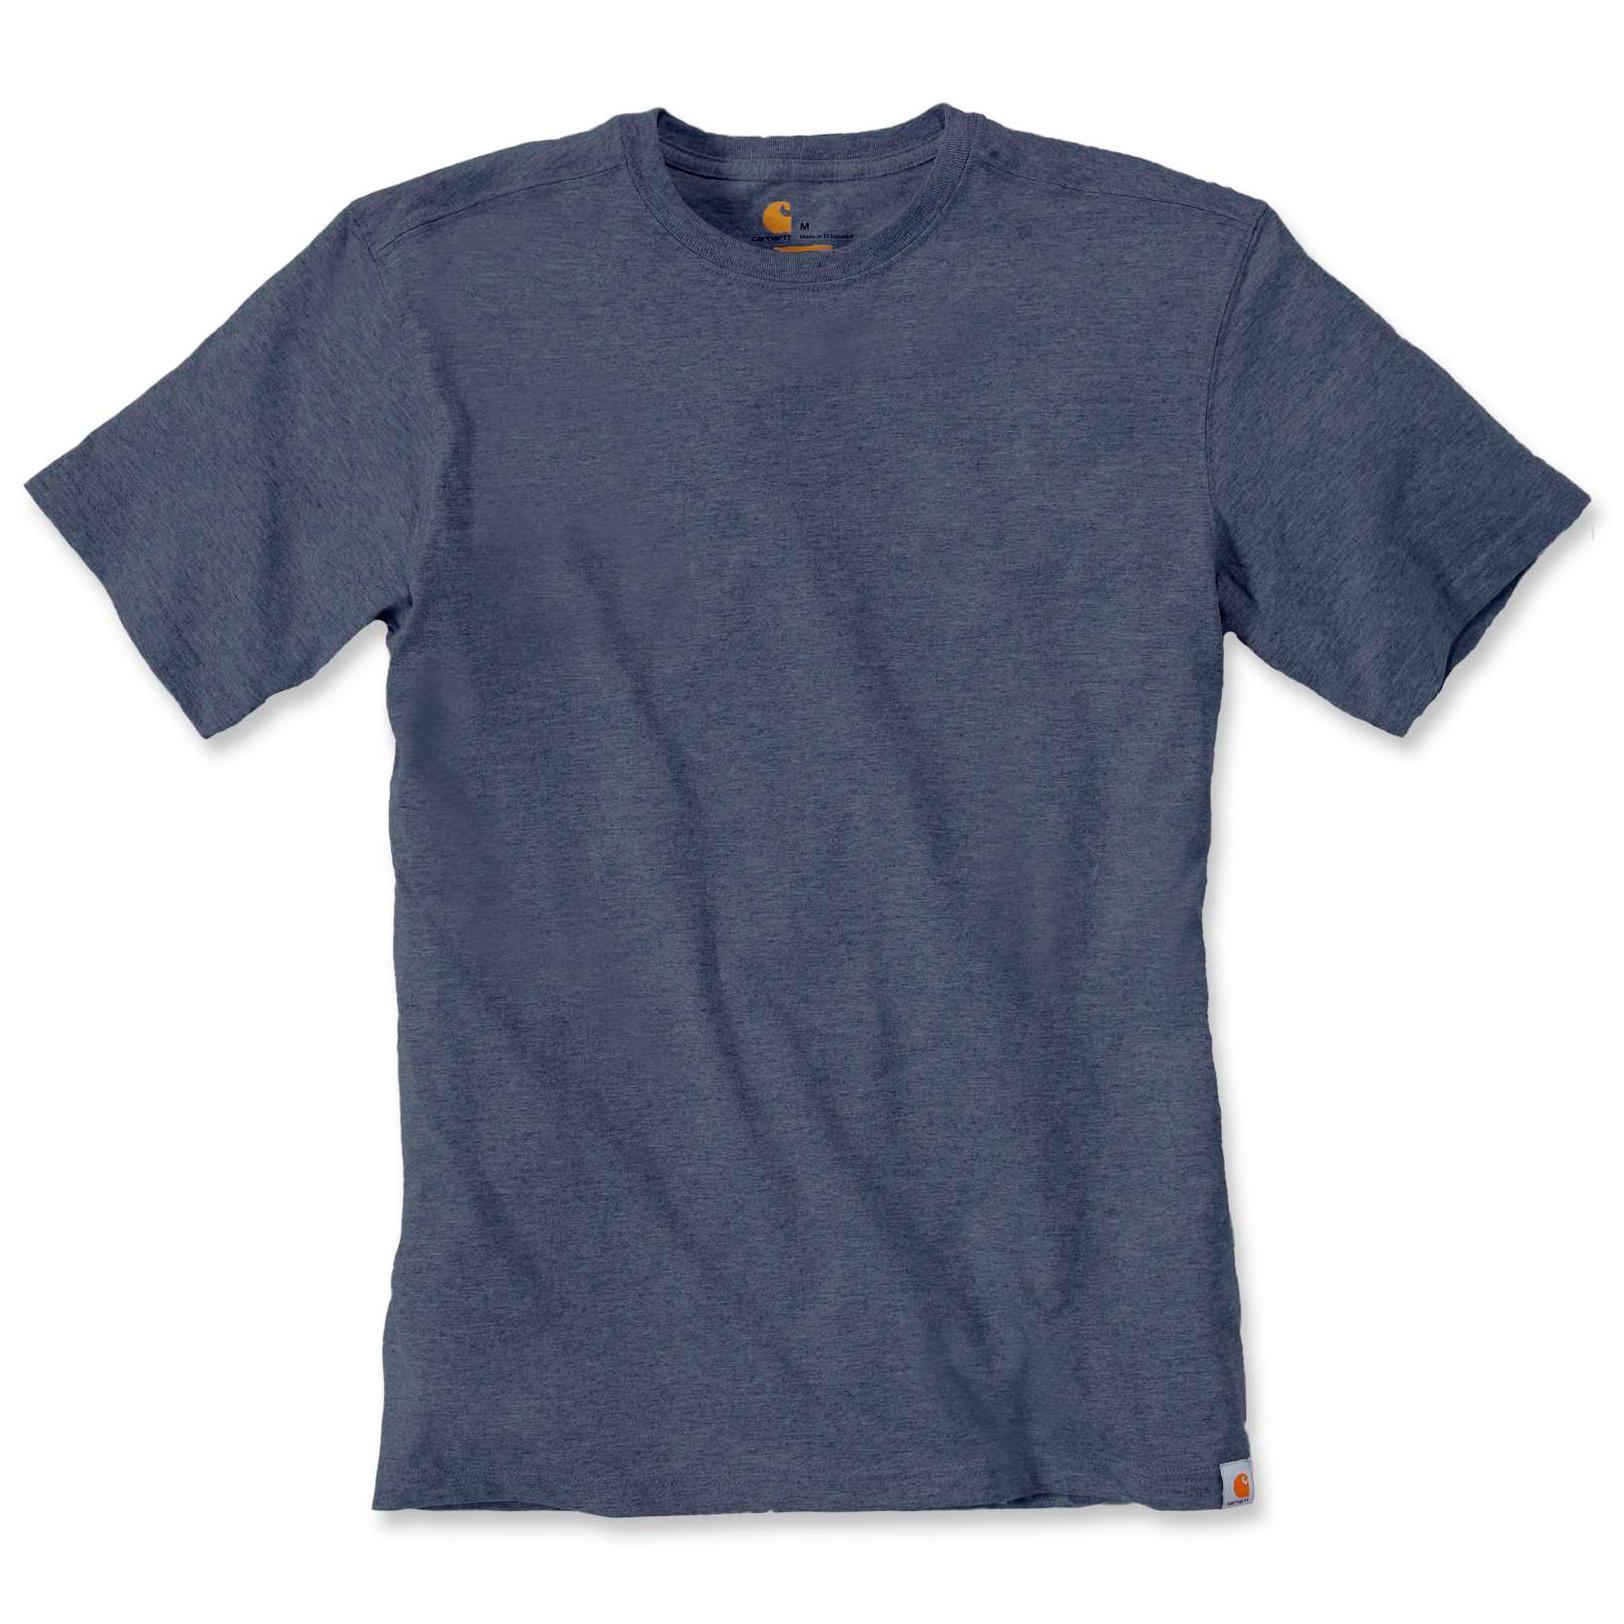 Футболка Carhartt Maddock T-Shirt S/S - 101124 (Indigo Heather, M)